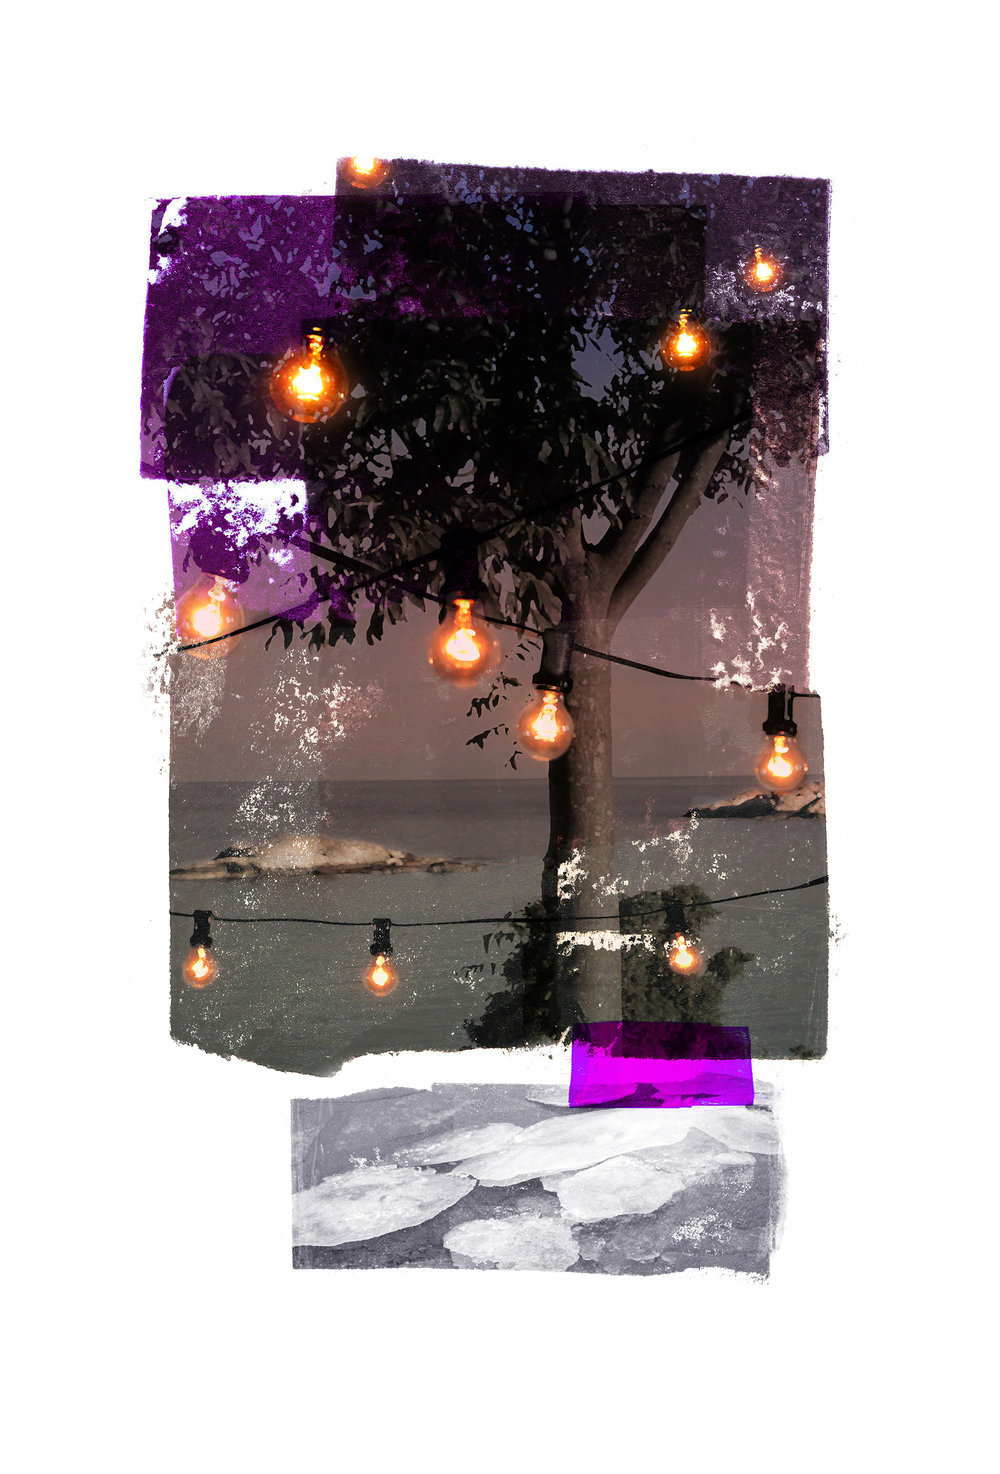 Rim of the party (Obstruction view) Archipelago  Original Archival UV Pigment Print / BFK Rives 250 gr 35 x 56 cm / 22 x 13,7 in Edition of 50 + 7 Ap Editeur: Per Fronth Studios / Printer Henrik Aunevik  08/2016: